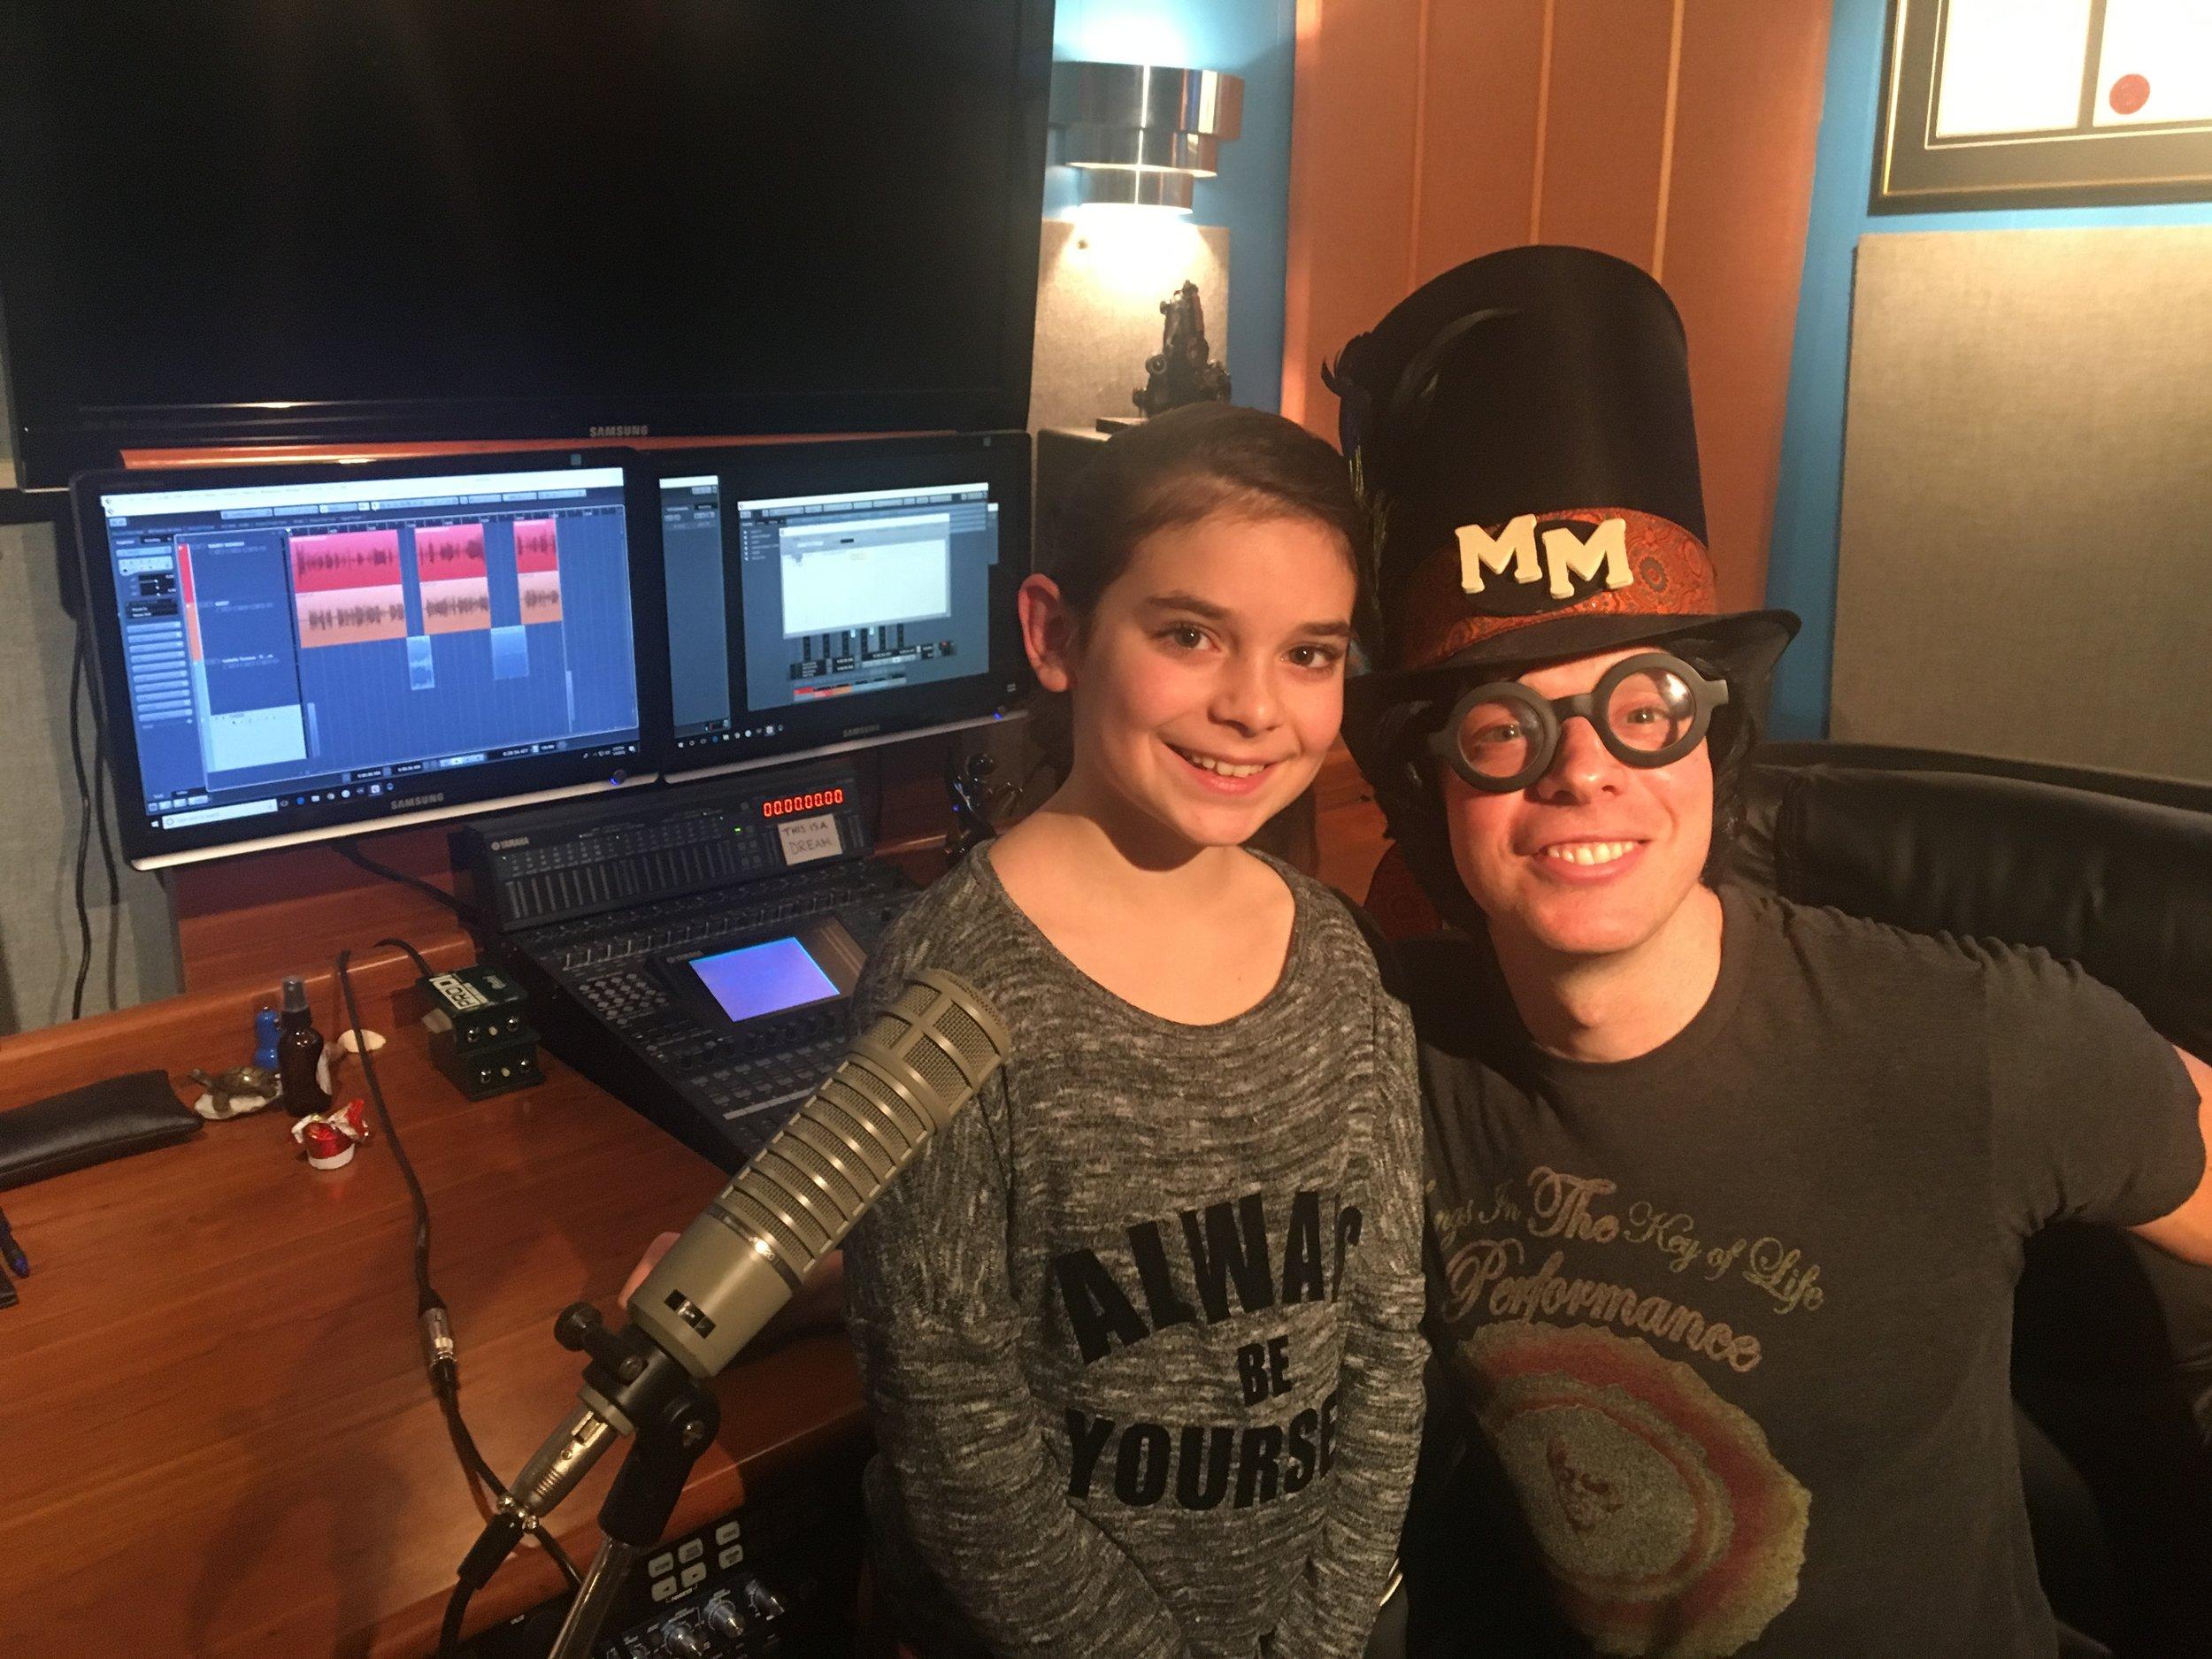 Isabella Tomaso with Marky Monday